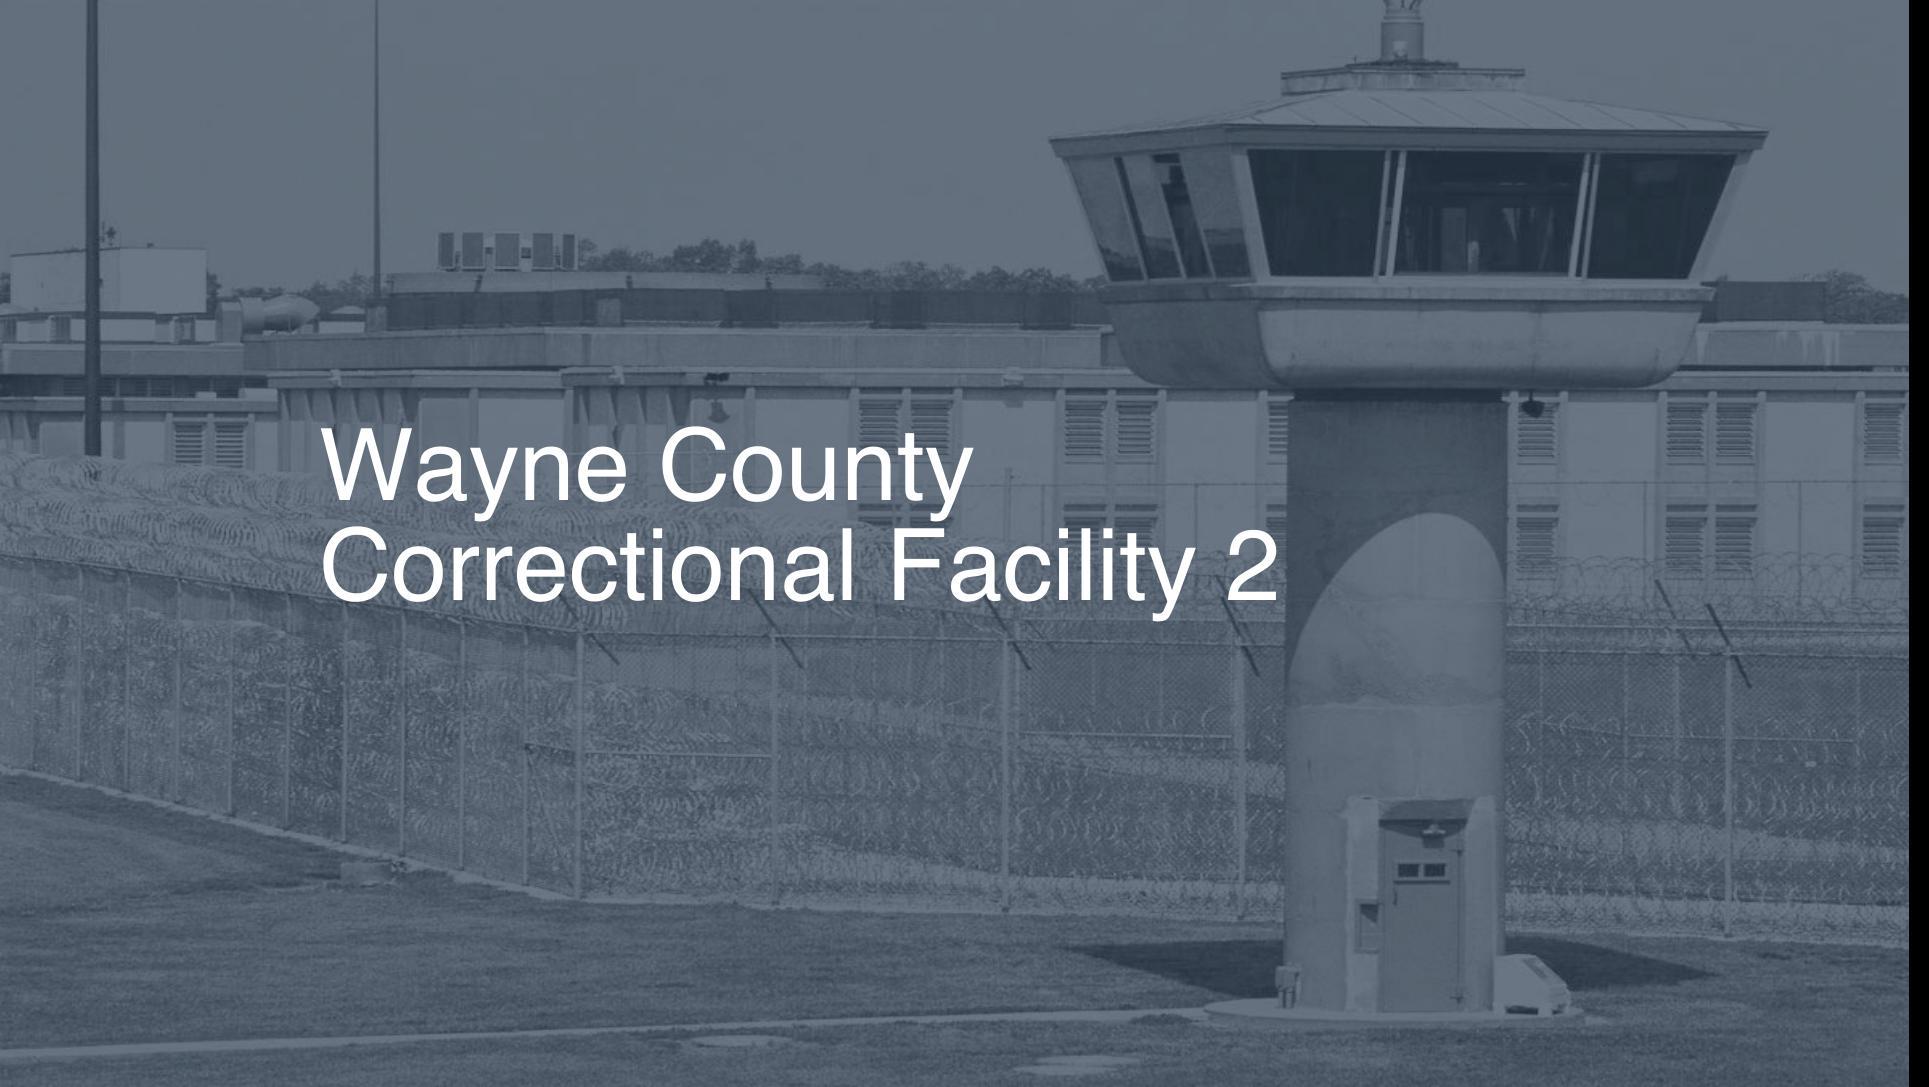 Wayne County Correctional Facility Inmate Search, Lookup